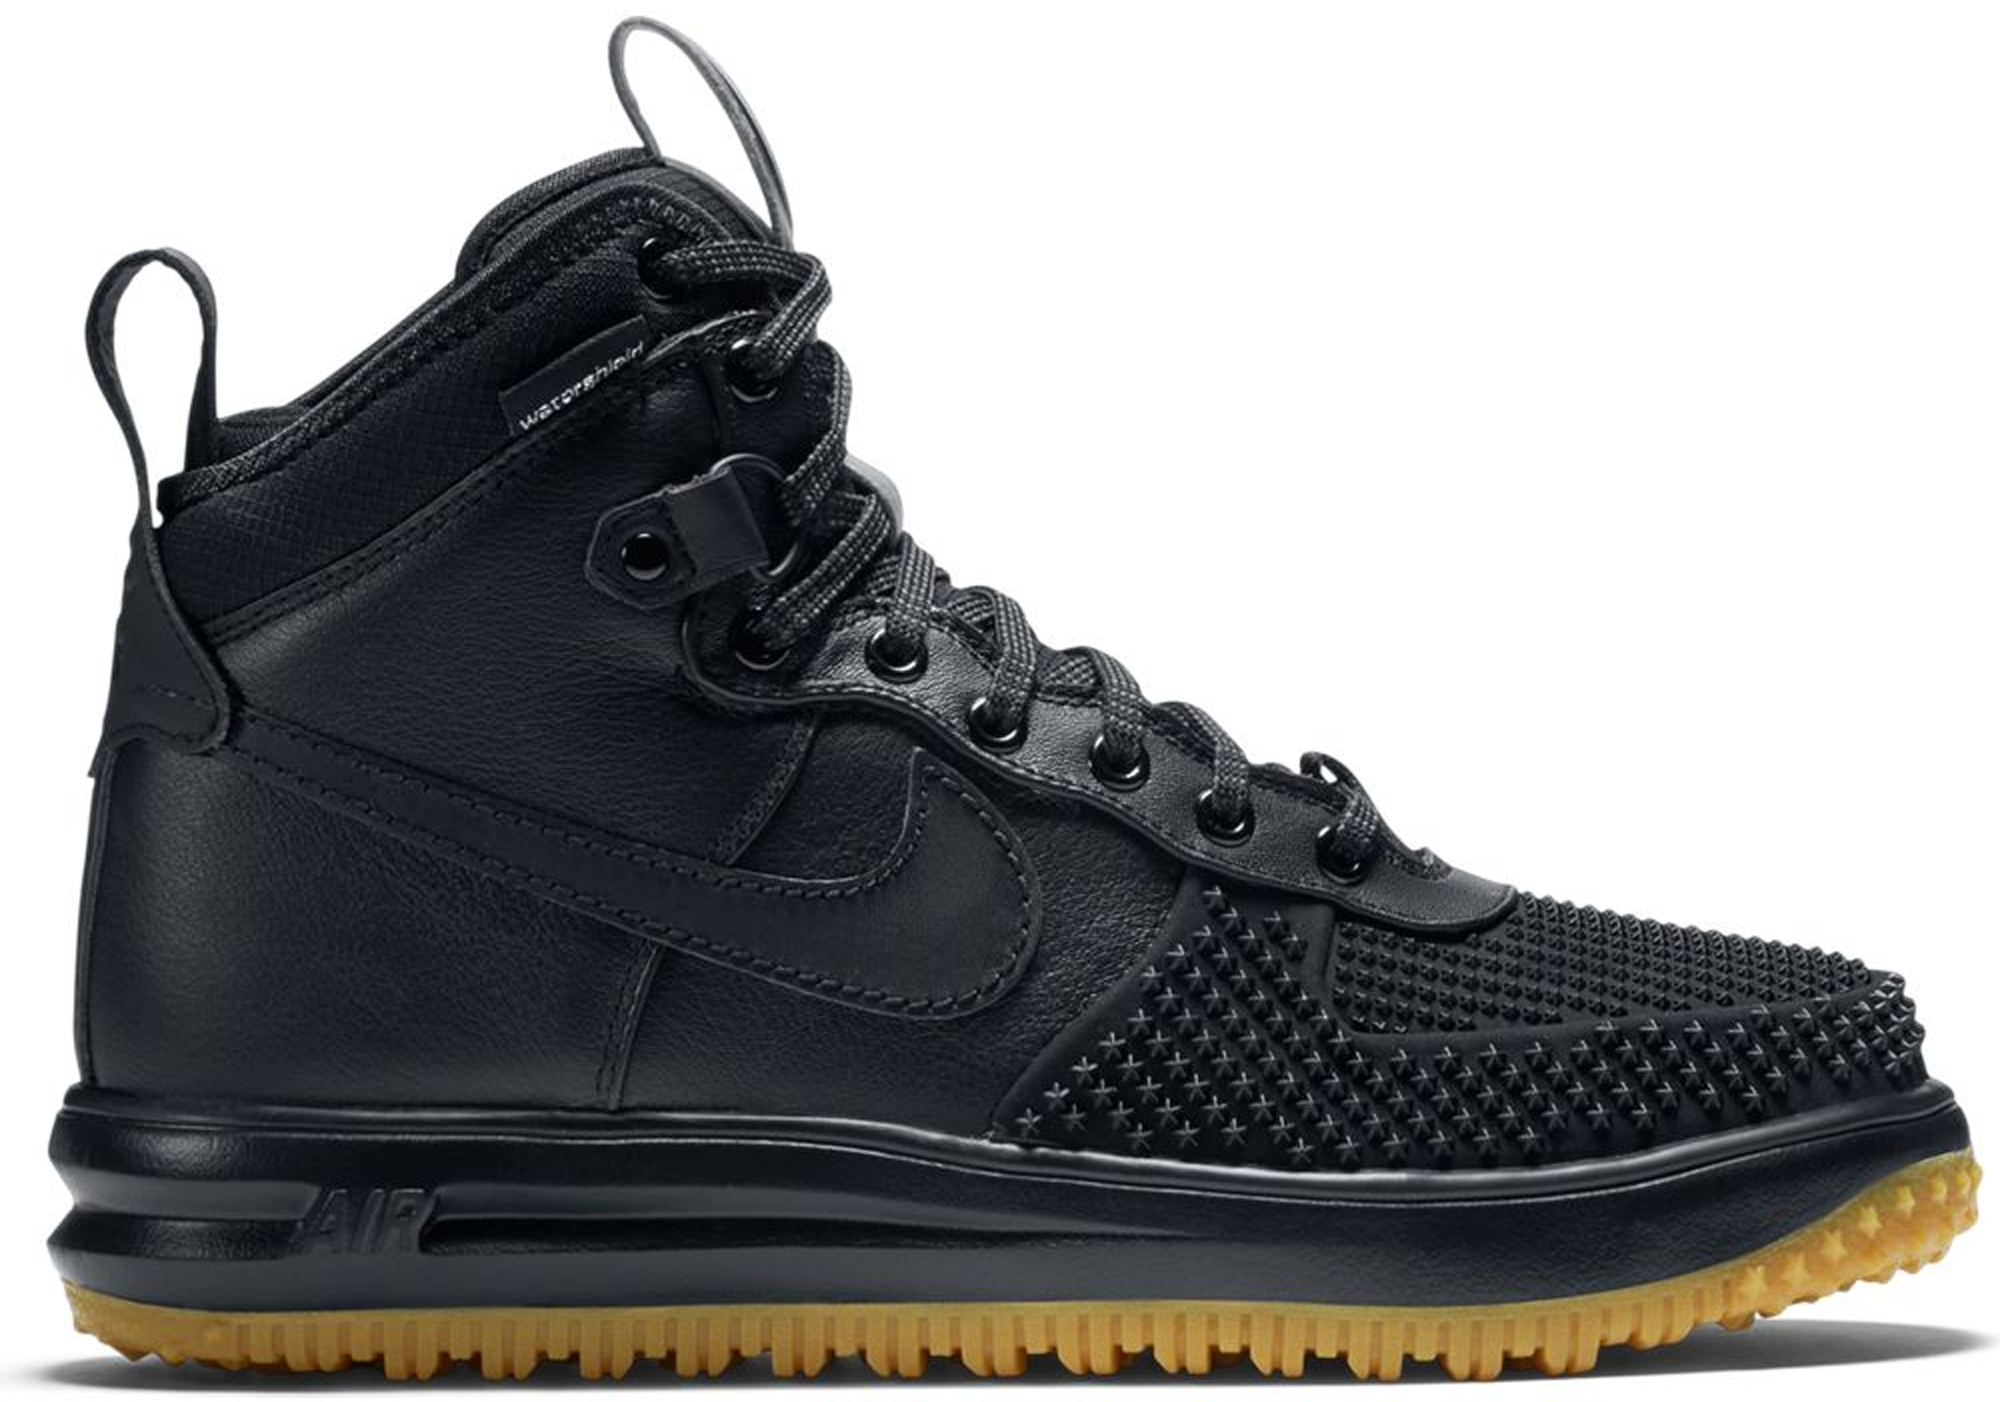 Nike Lunar Force 1 Duckboot Black Gum